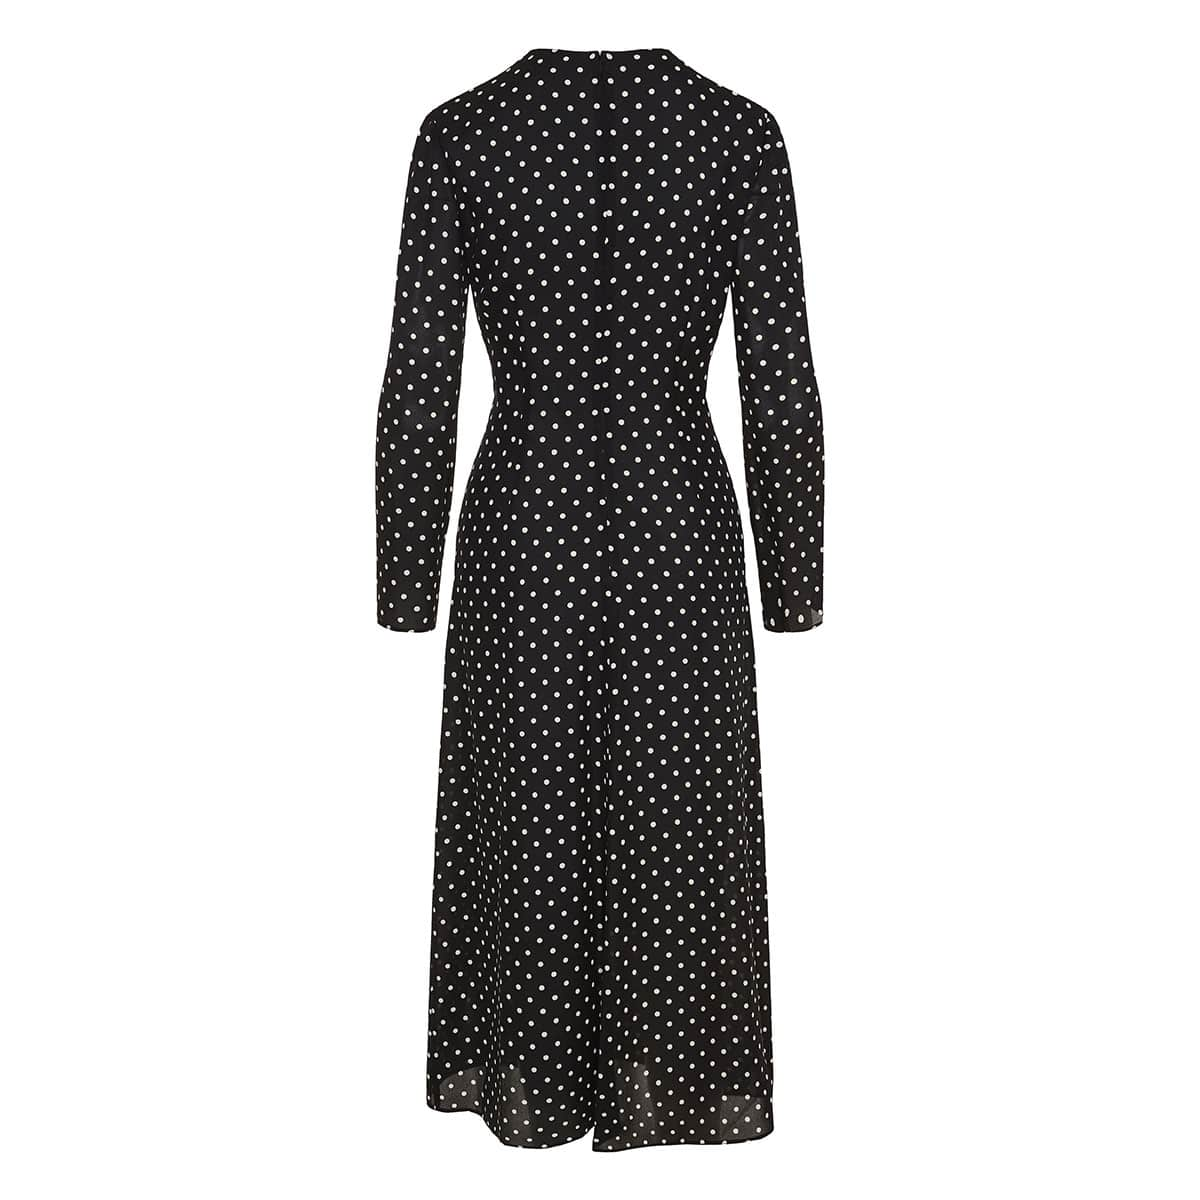 Polka-dot knotted midi dress